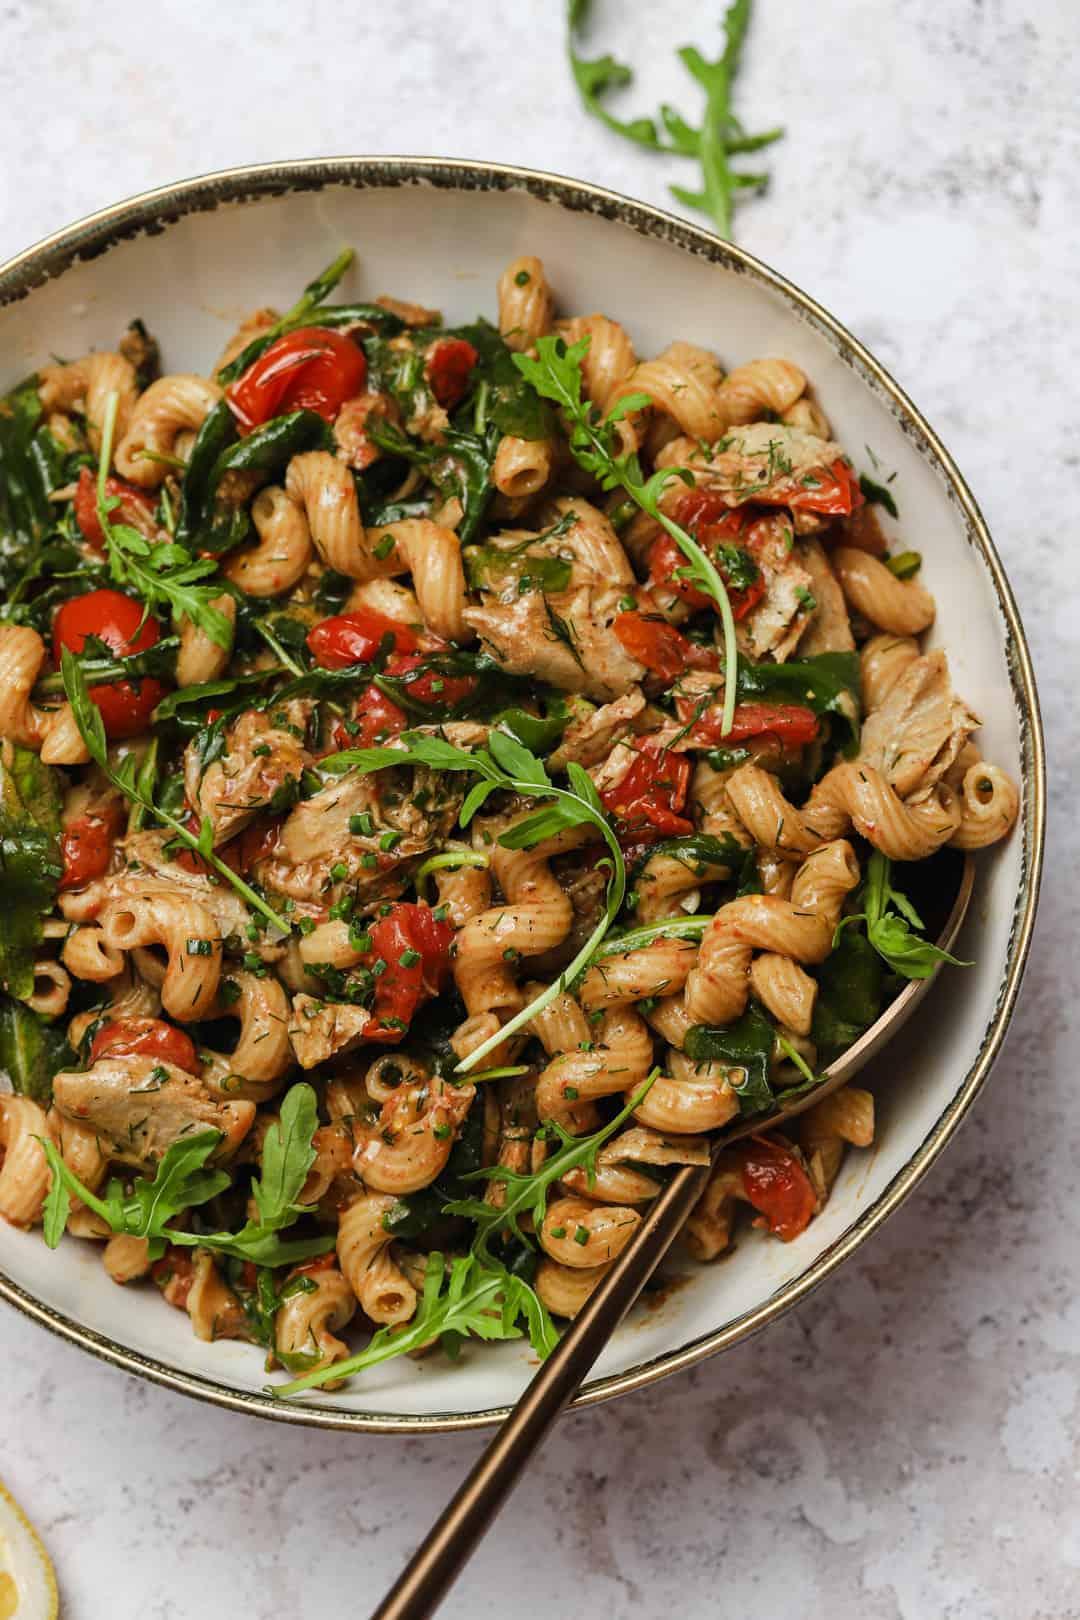 Tuna pasta salad with arugula